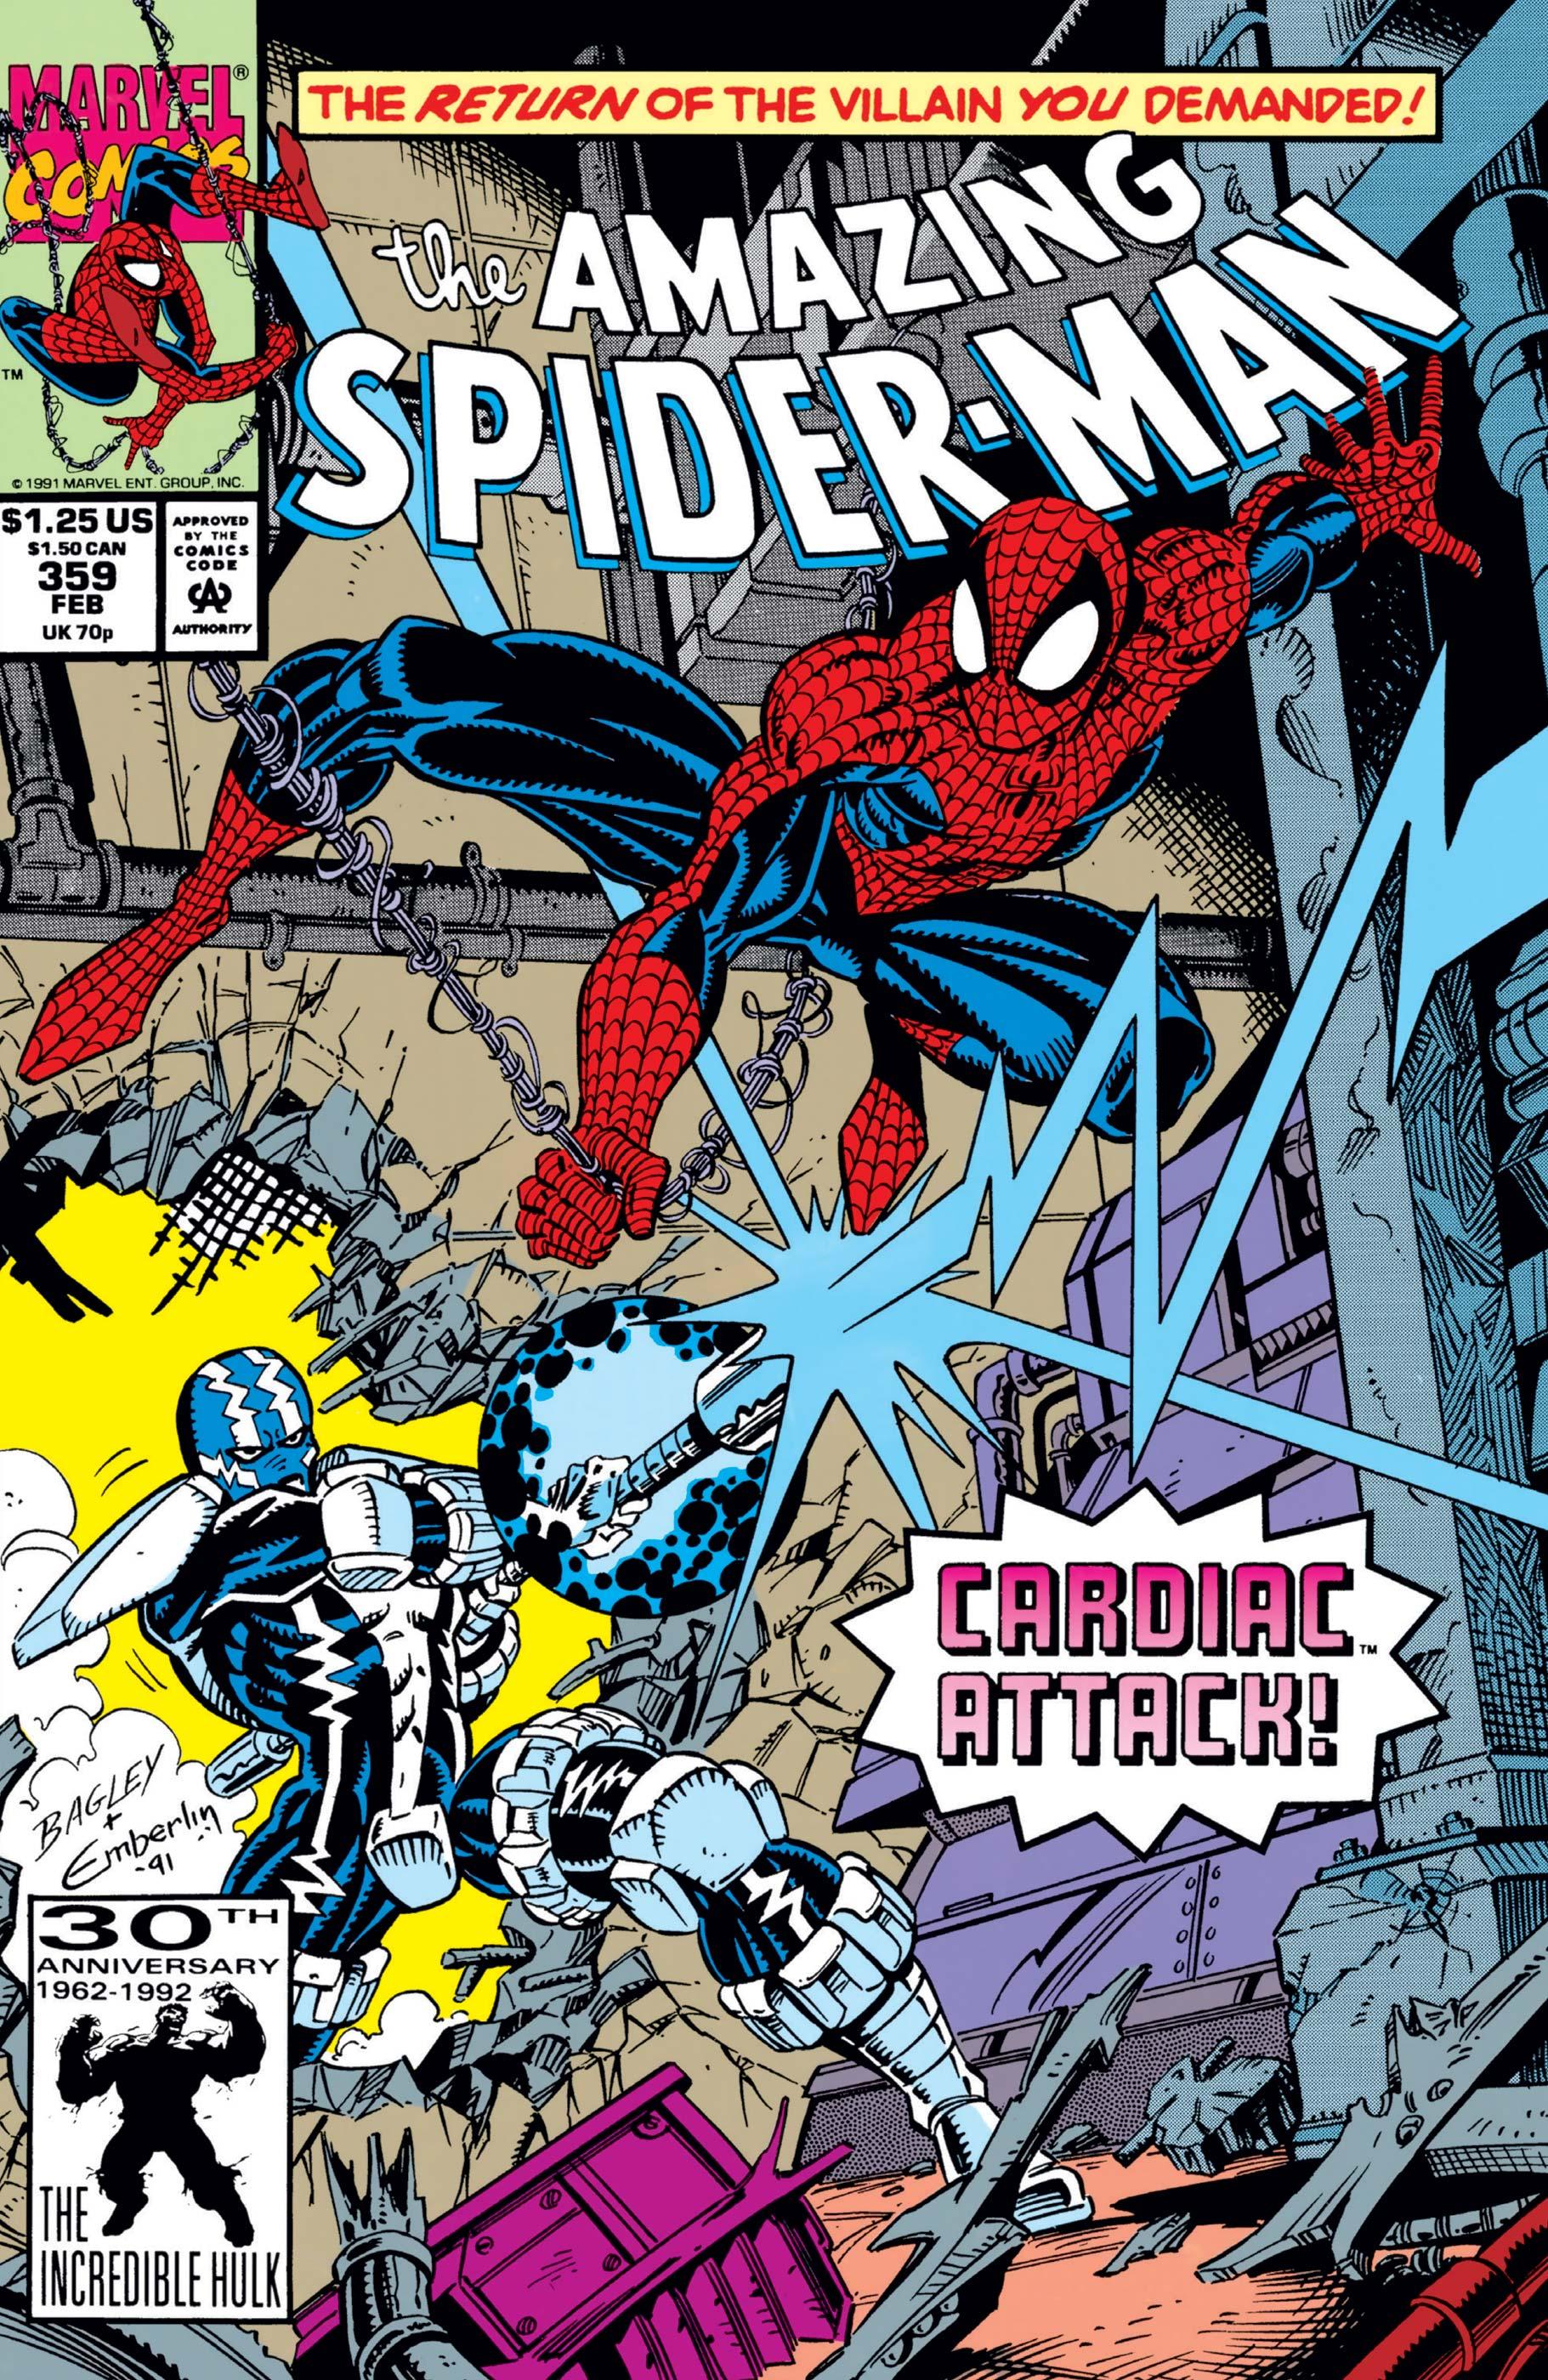 The Amazing Spider-Man (1963) #359